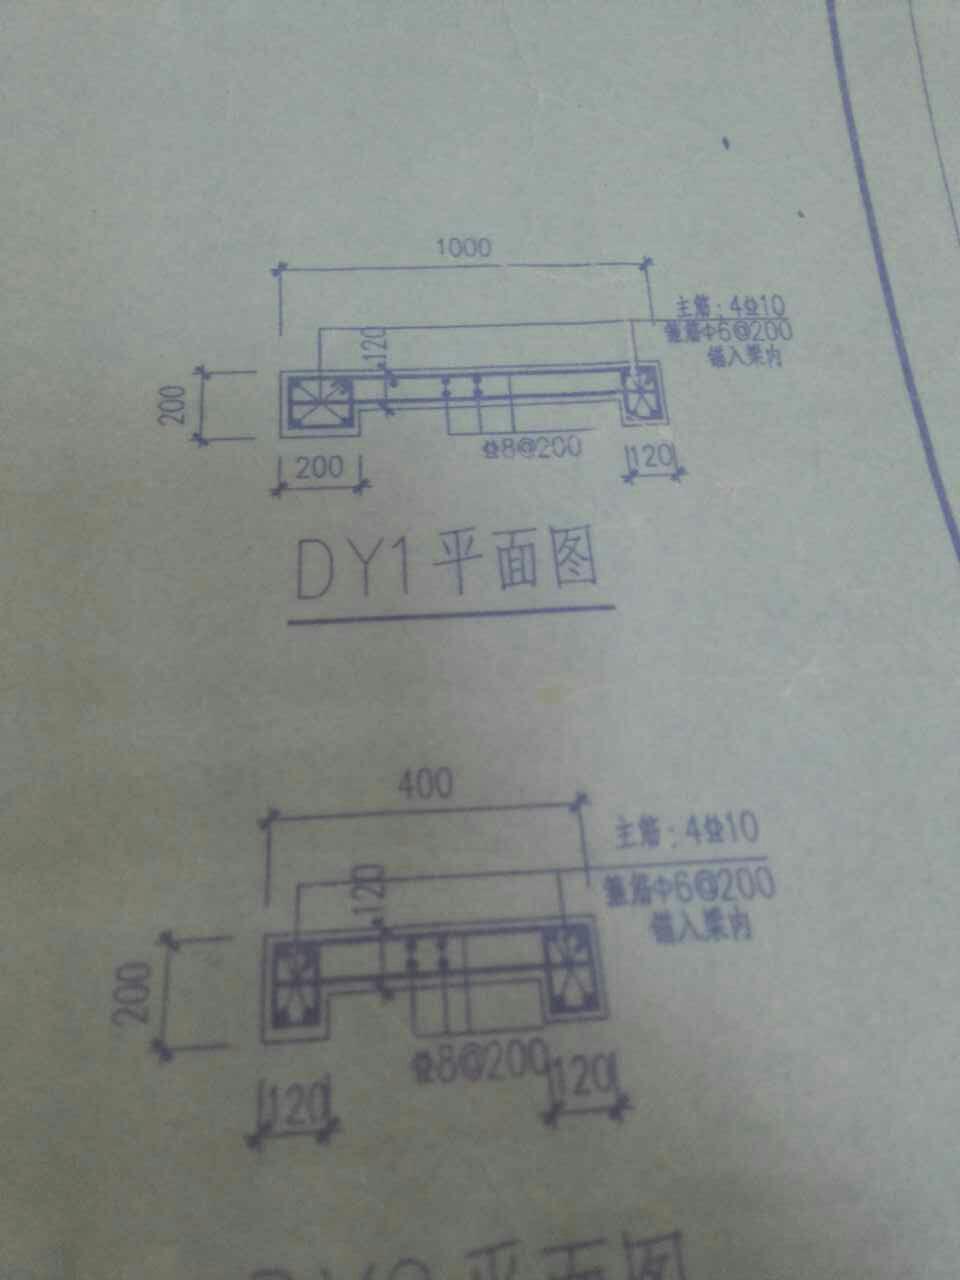 DY1在社区白兔中,DY1表示?以图纸定构件钢筋视频图片